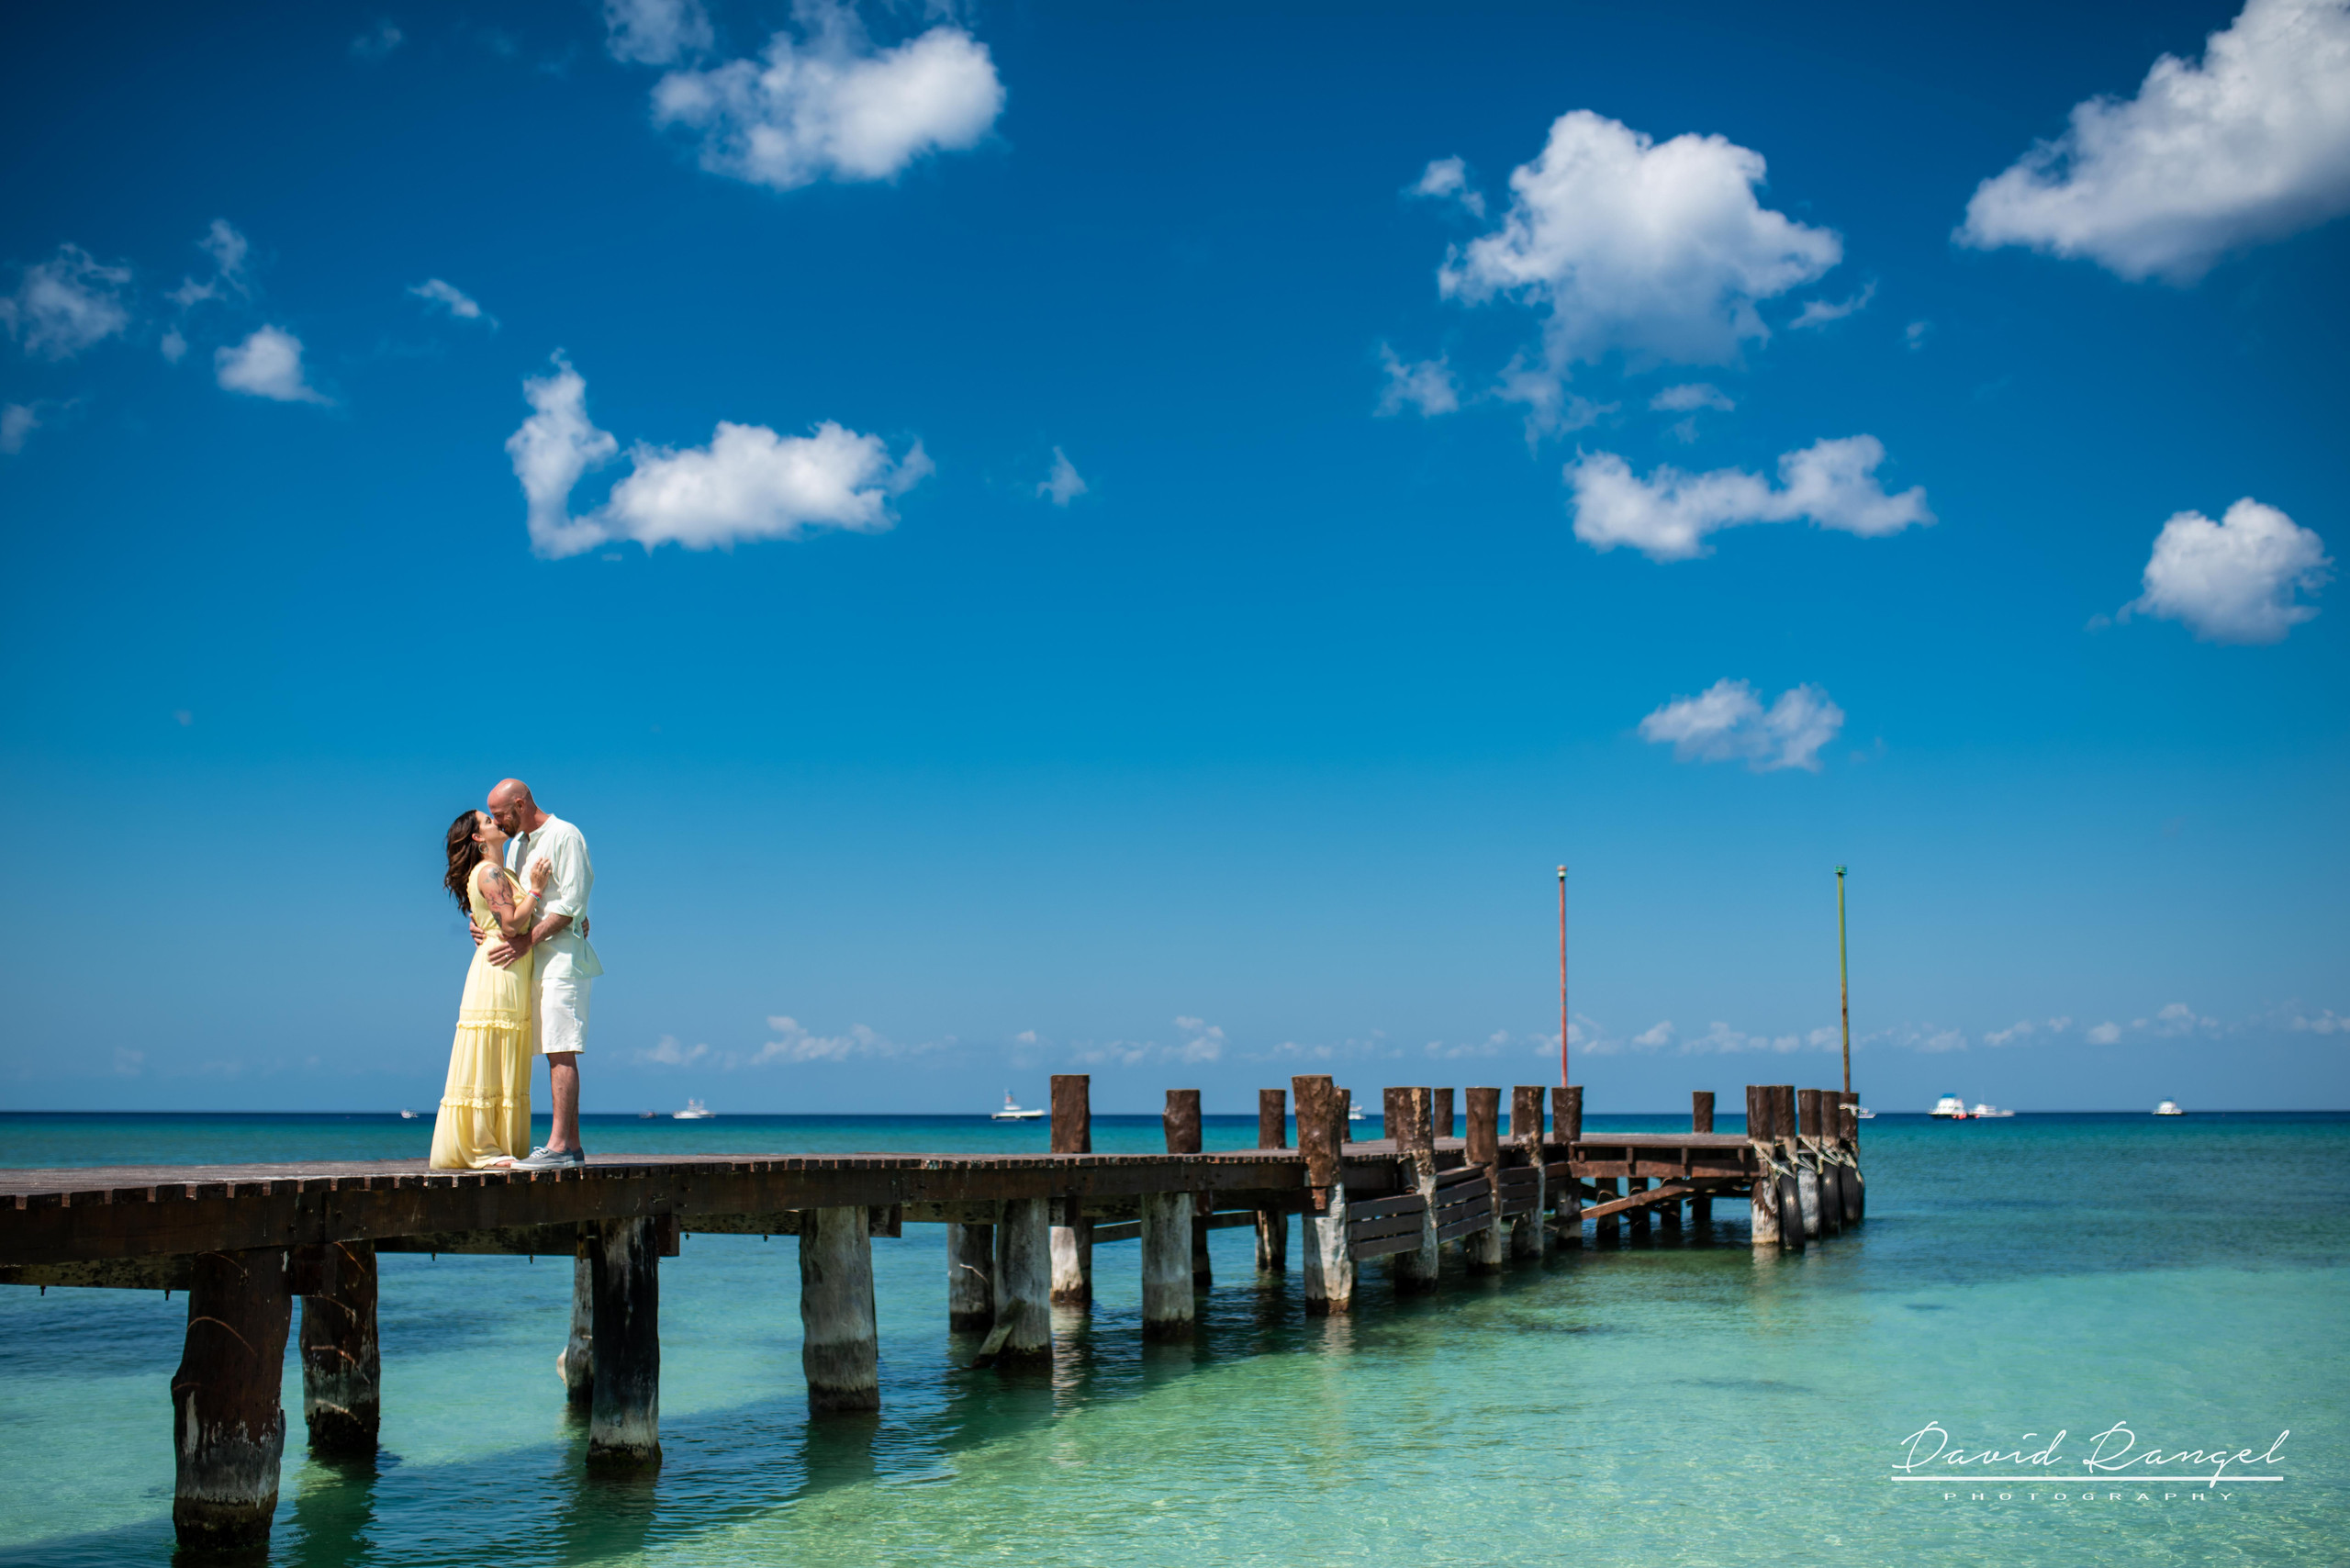 session+beach+cozumel+island+photo+destination+photographer+couple+water+pier+paradise